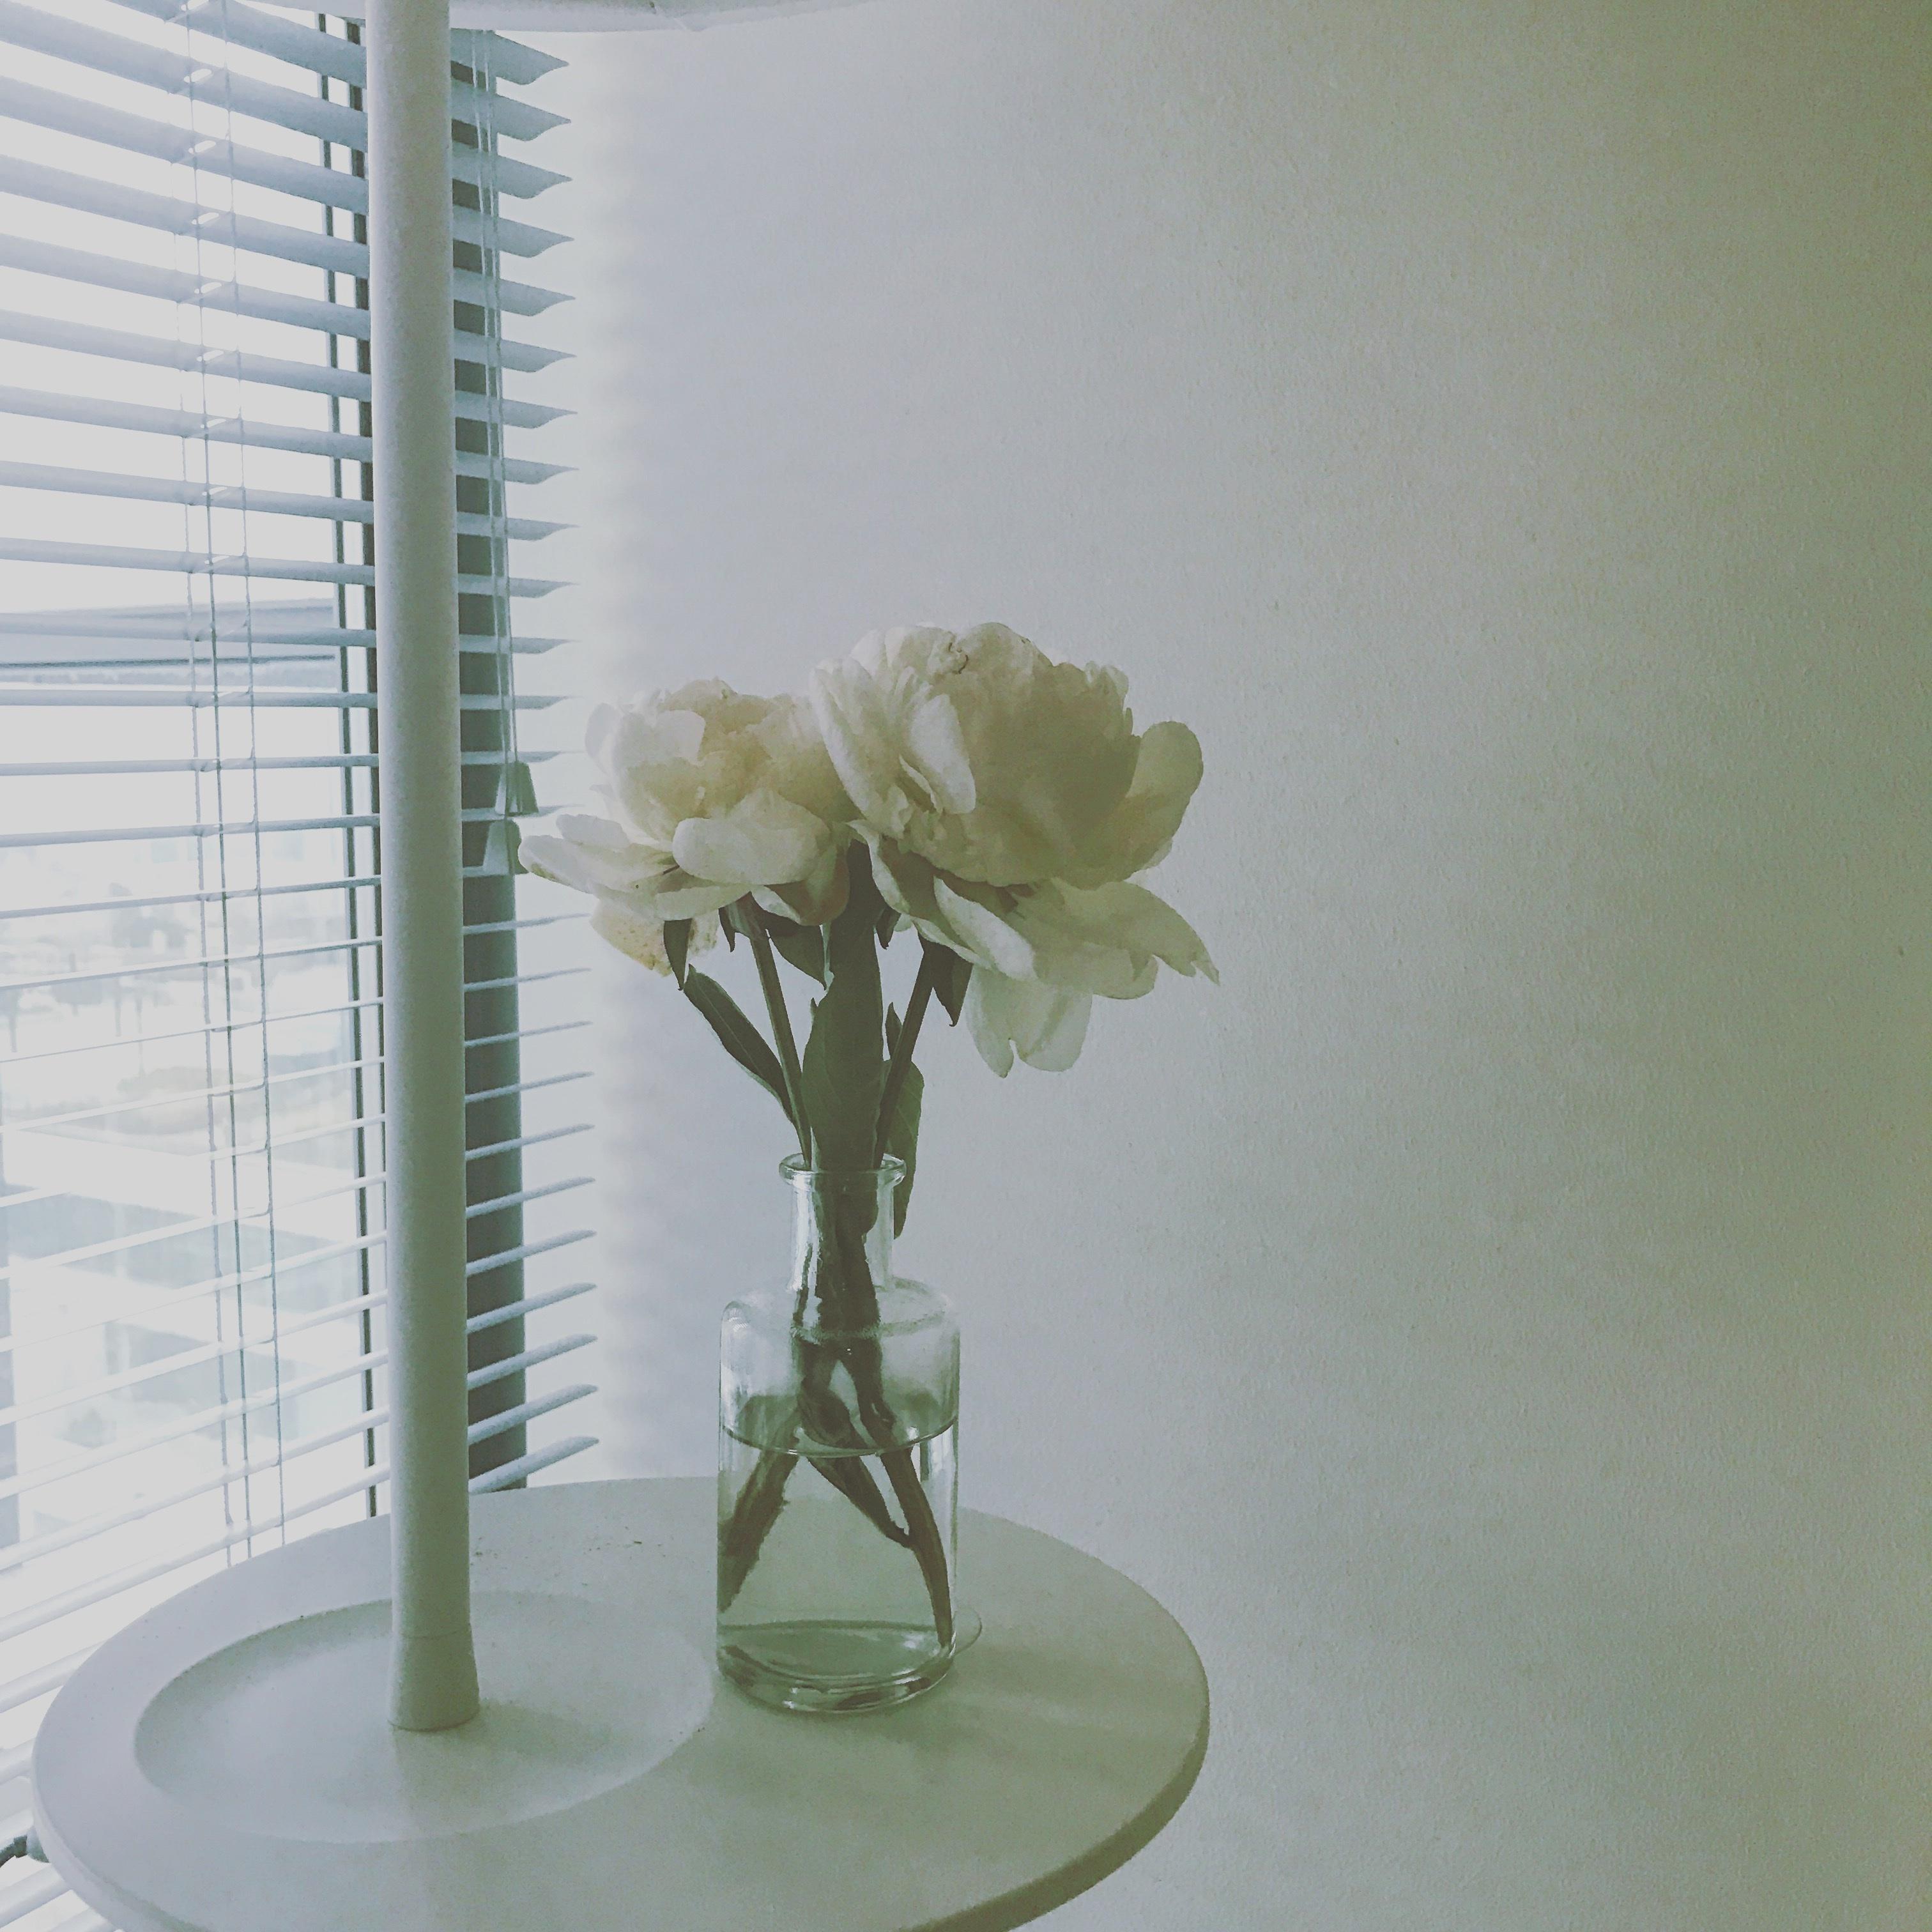 images gratuites fleur verre vase vert clairage. Black Bedroom Furniture Sets. Home Design Ideas